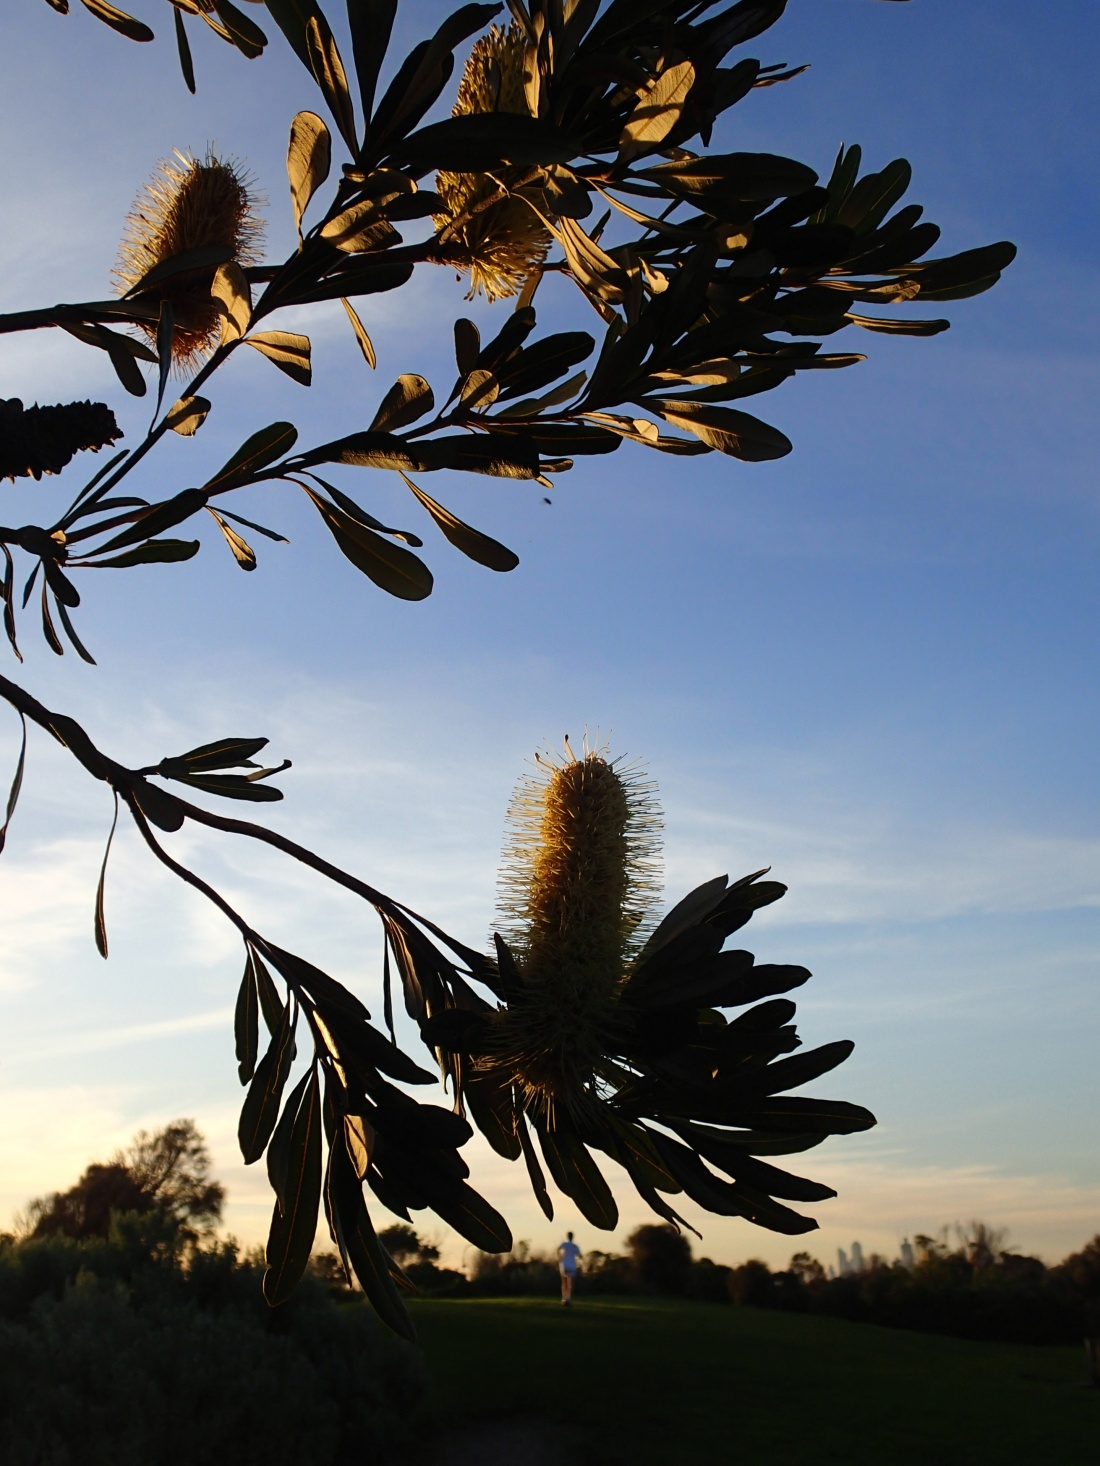 Banksia silhouette